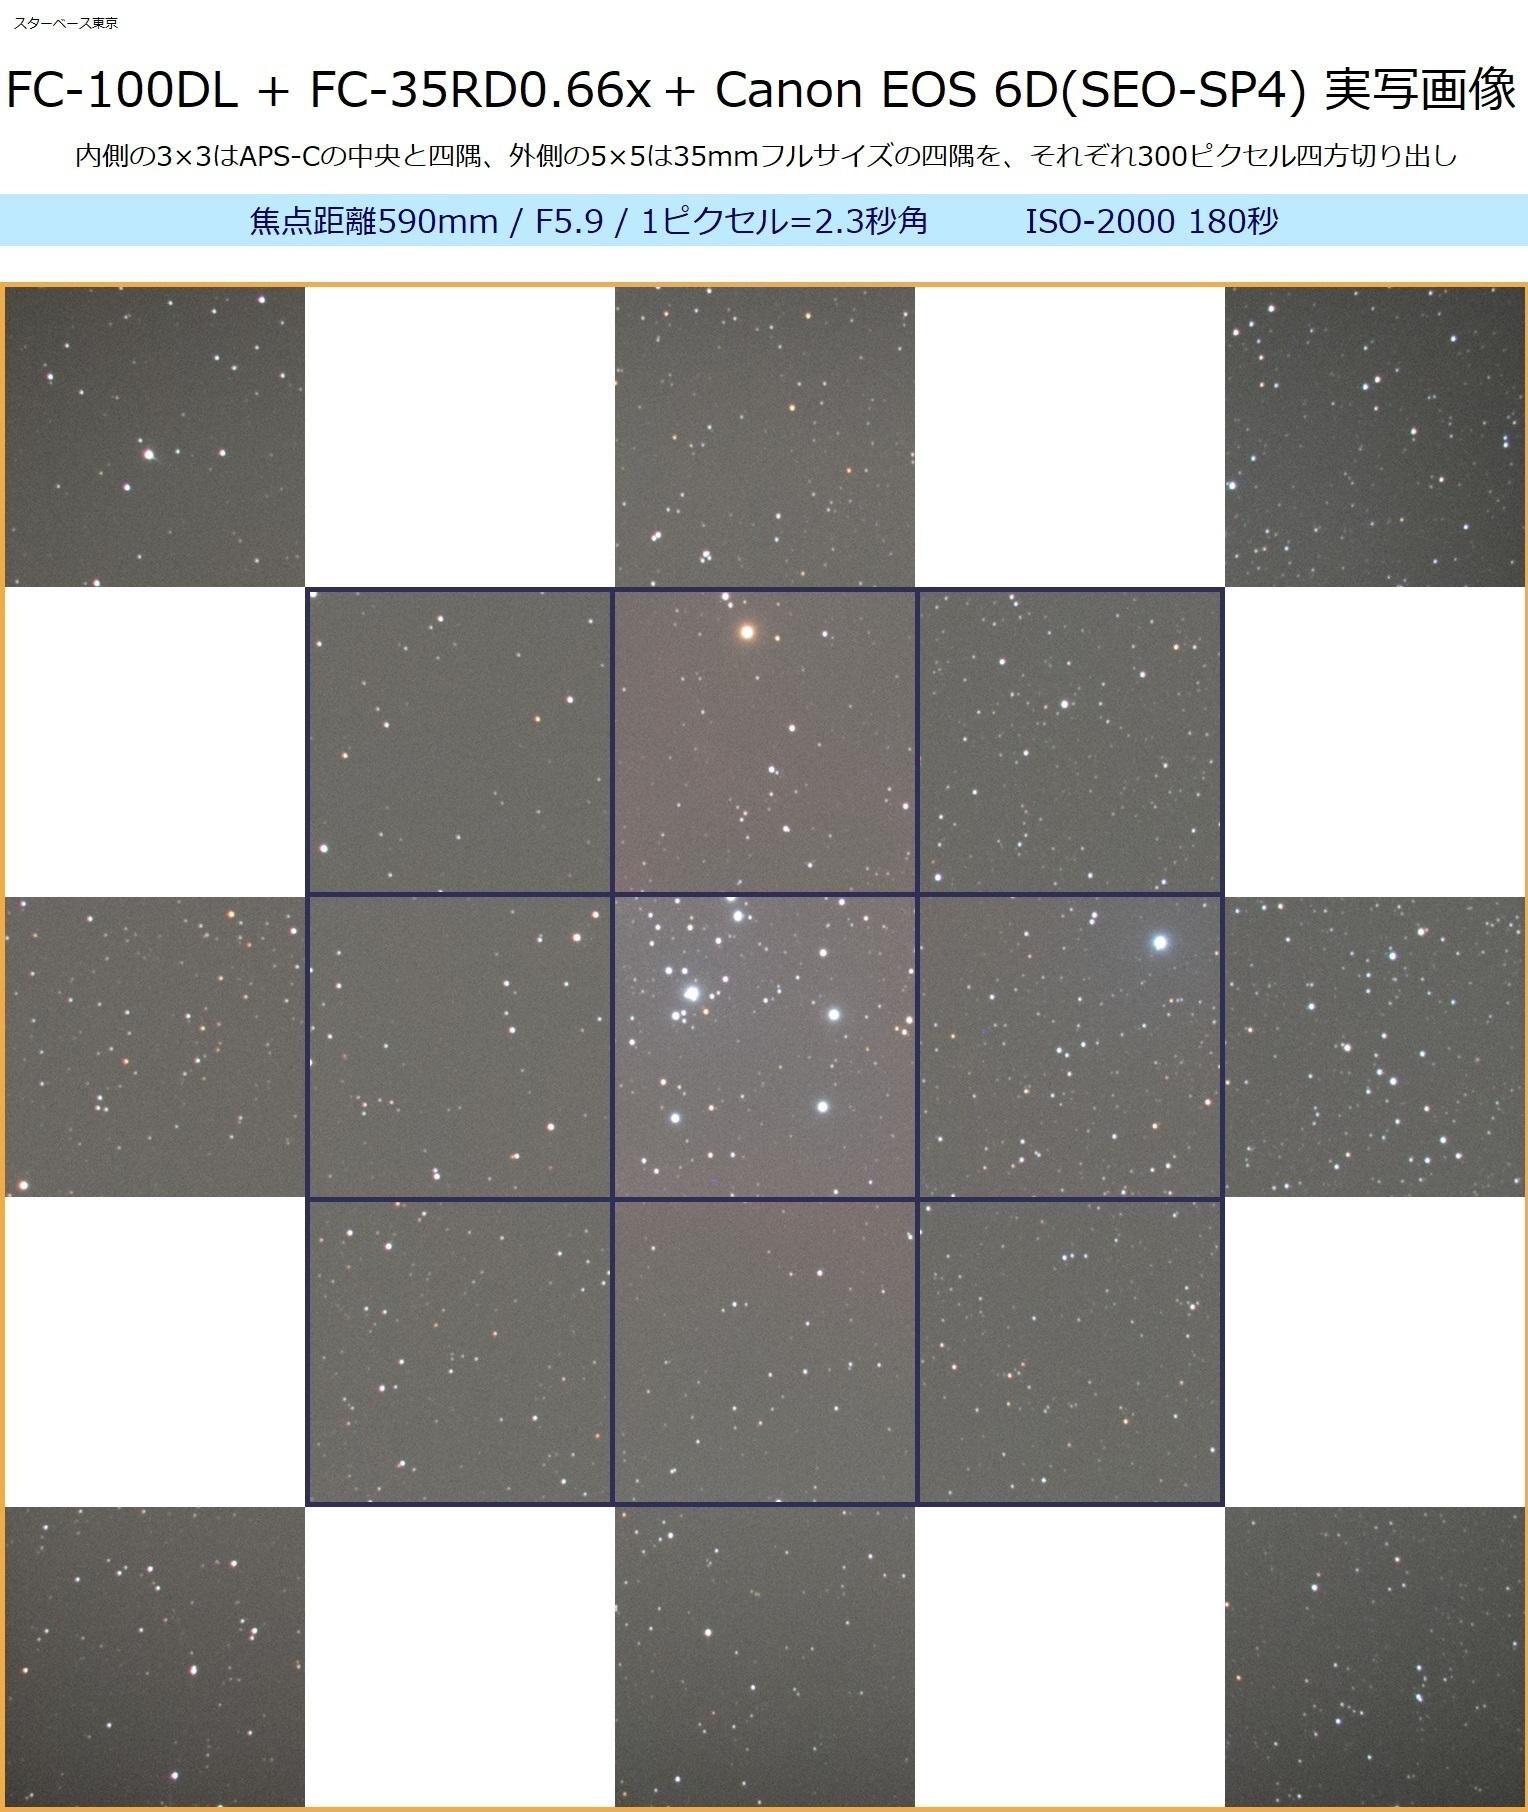 f:id:starbase:20190218211901j:plain